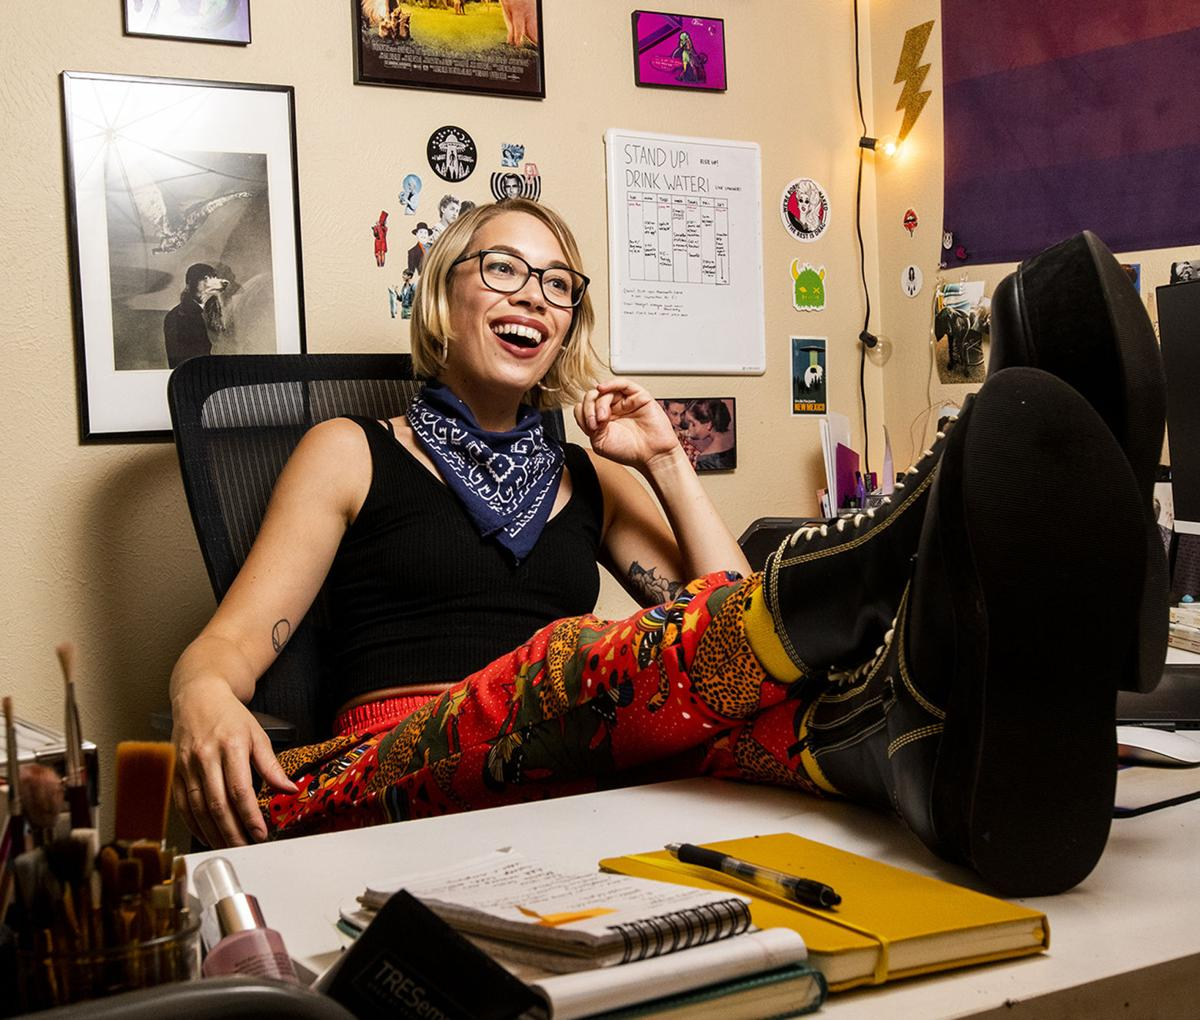 Entertainer: Megan Toenyes cover